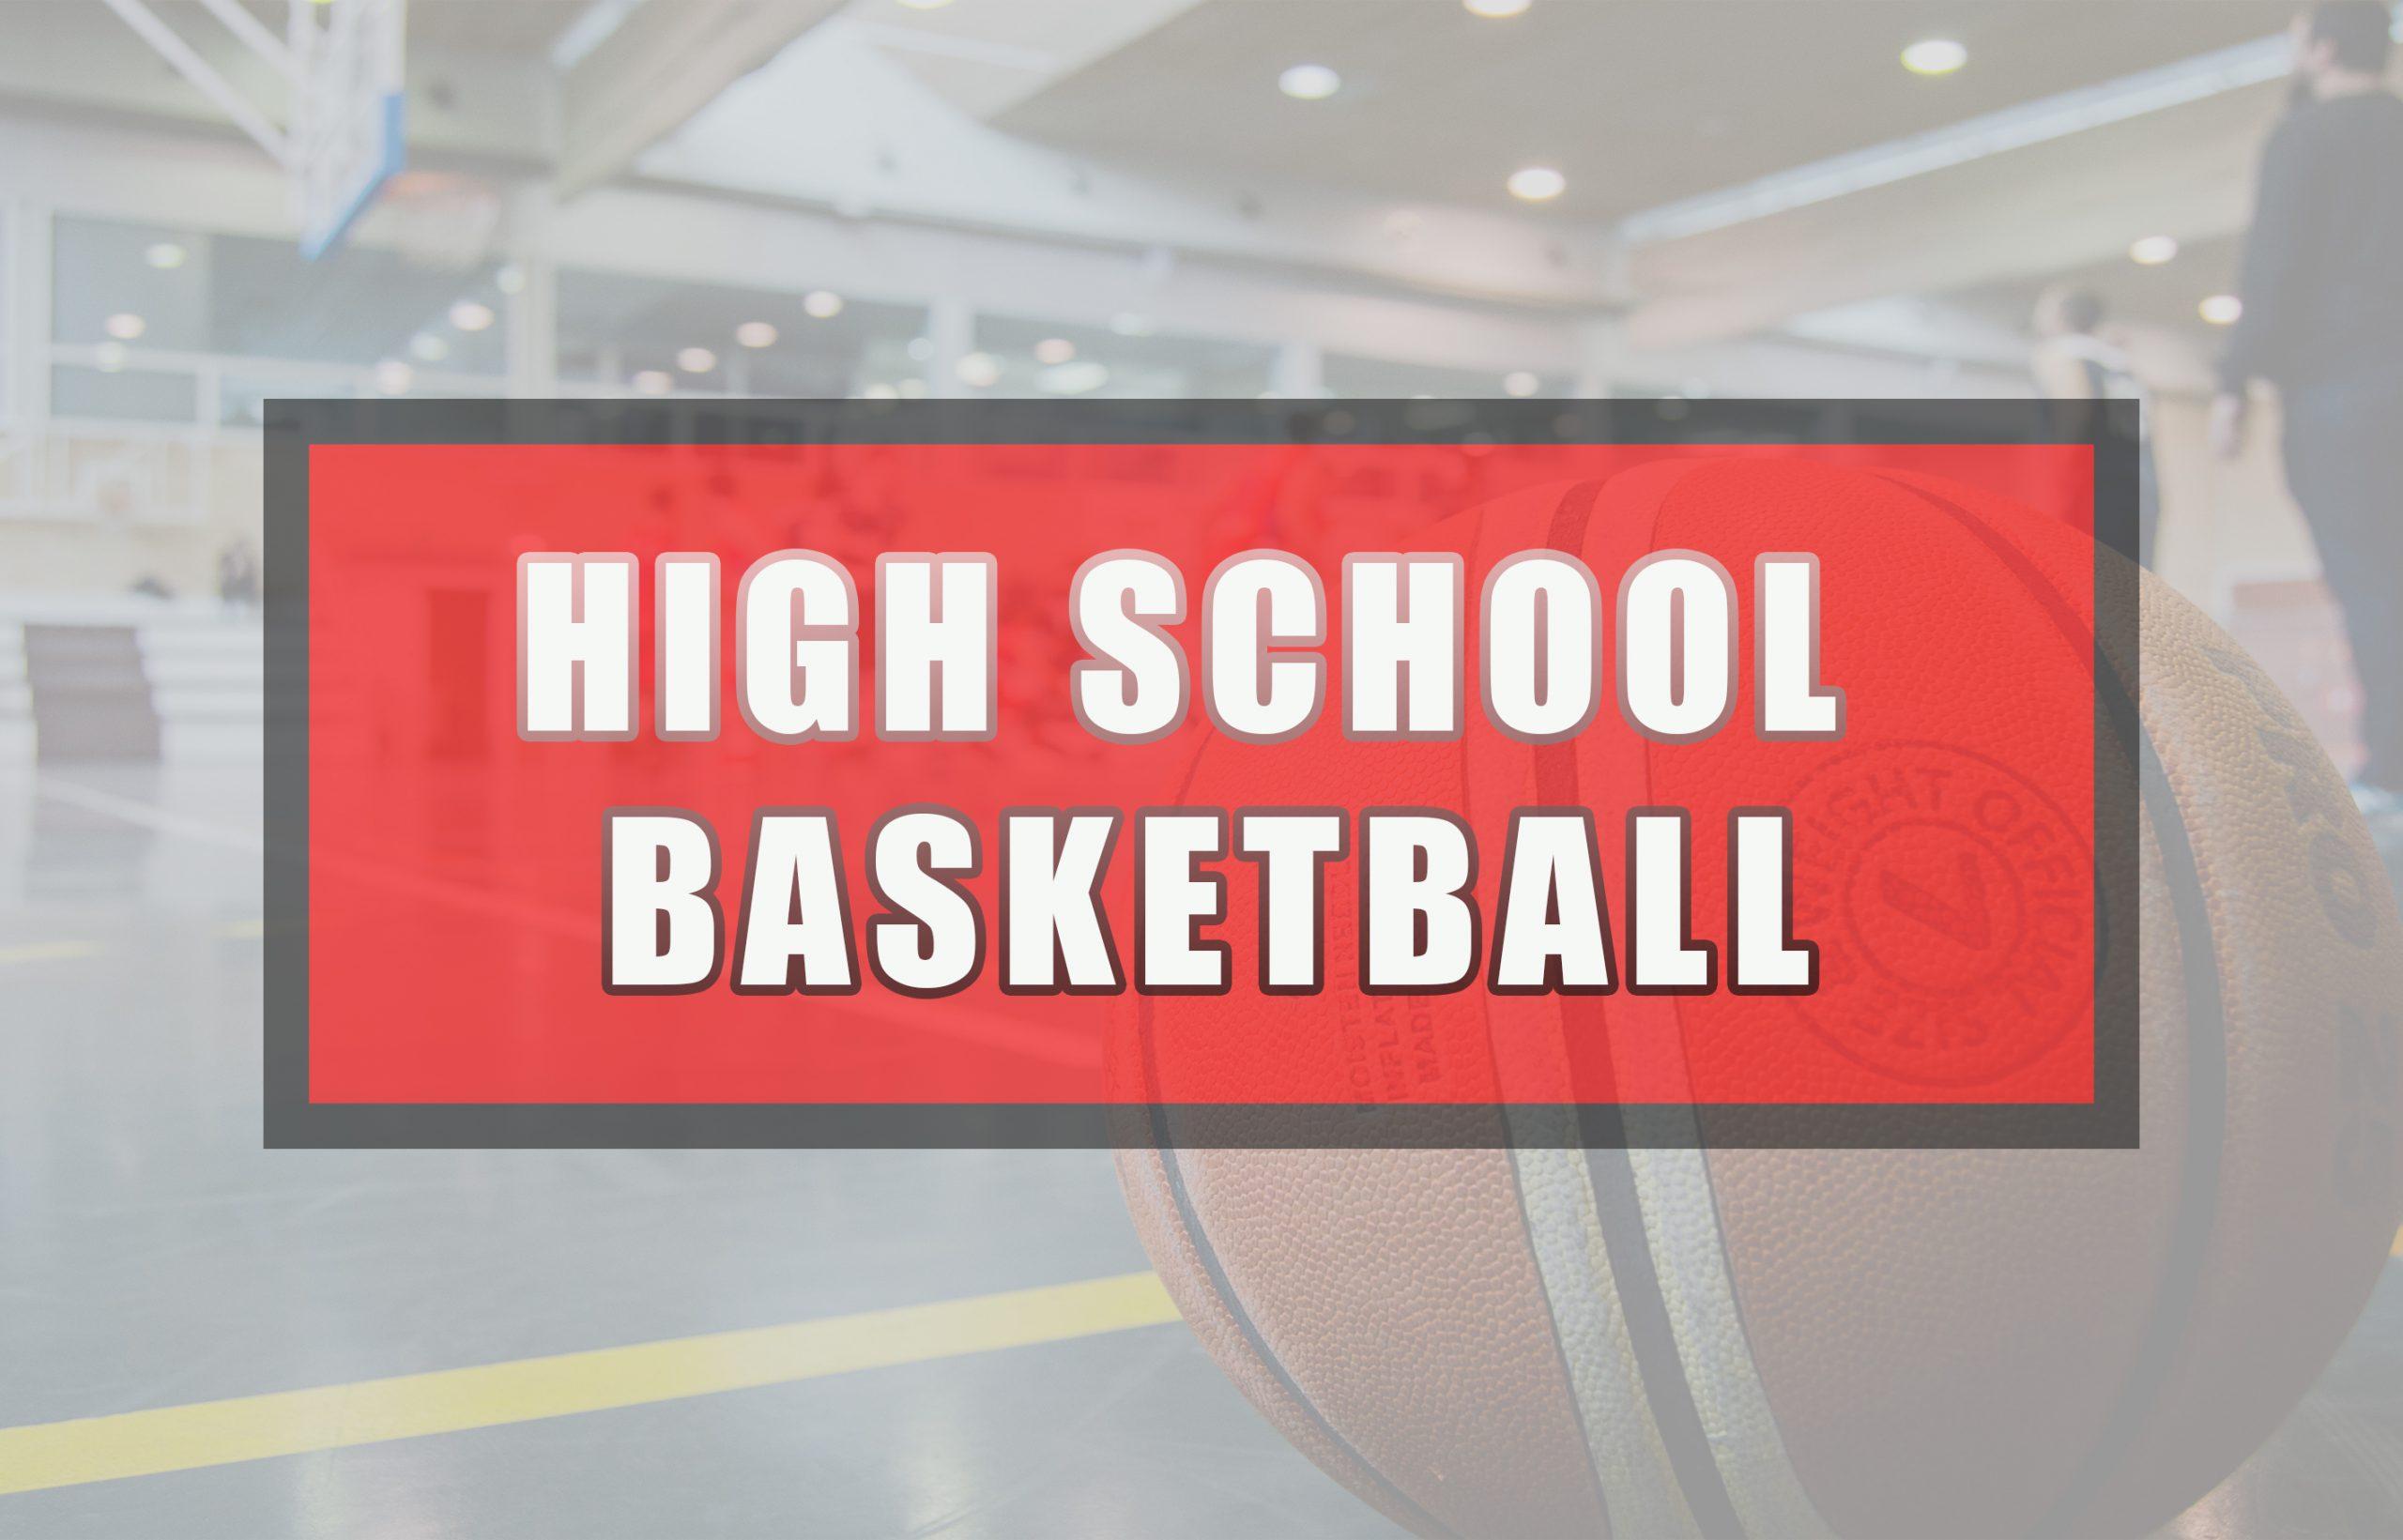 High School Basketball Schedule for Saturday